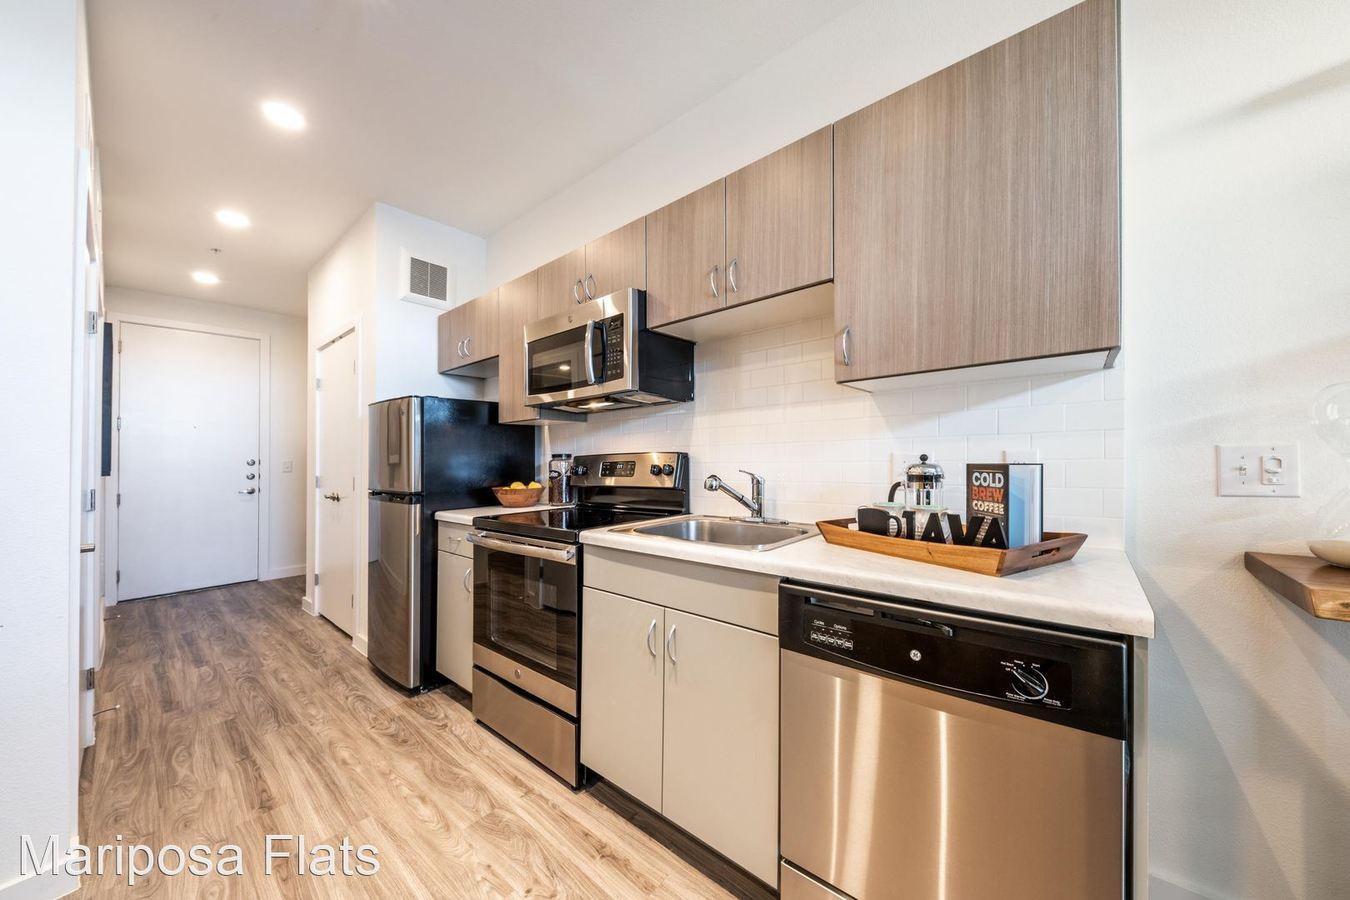 Studio 1 Bathroom Apartment for rent at Mariposa Flats in Austin, TX